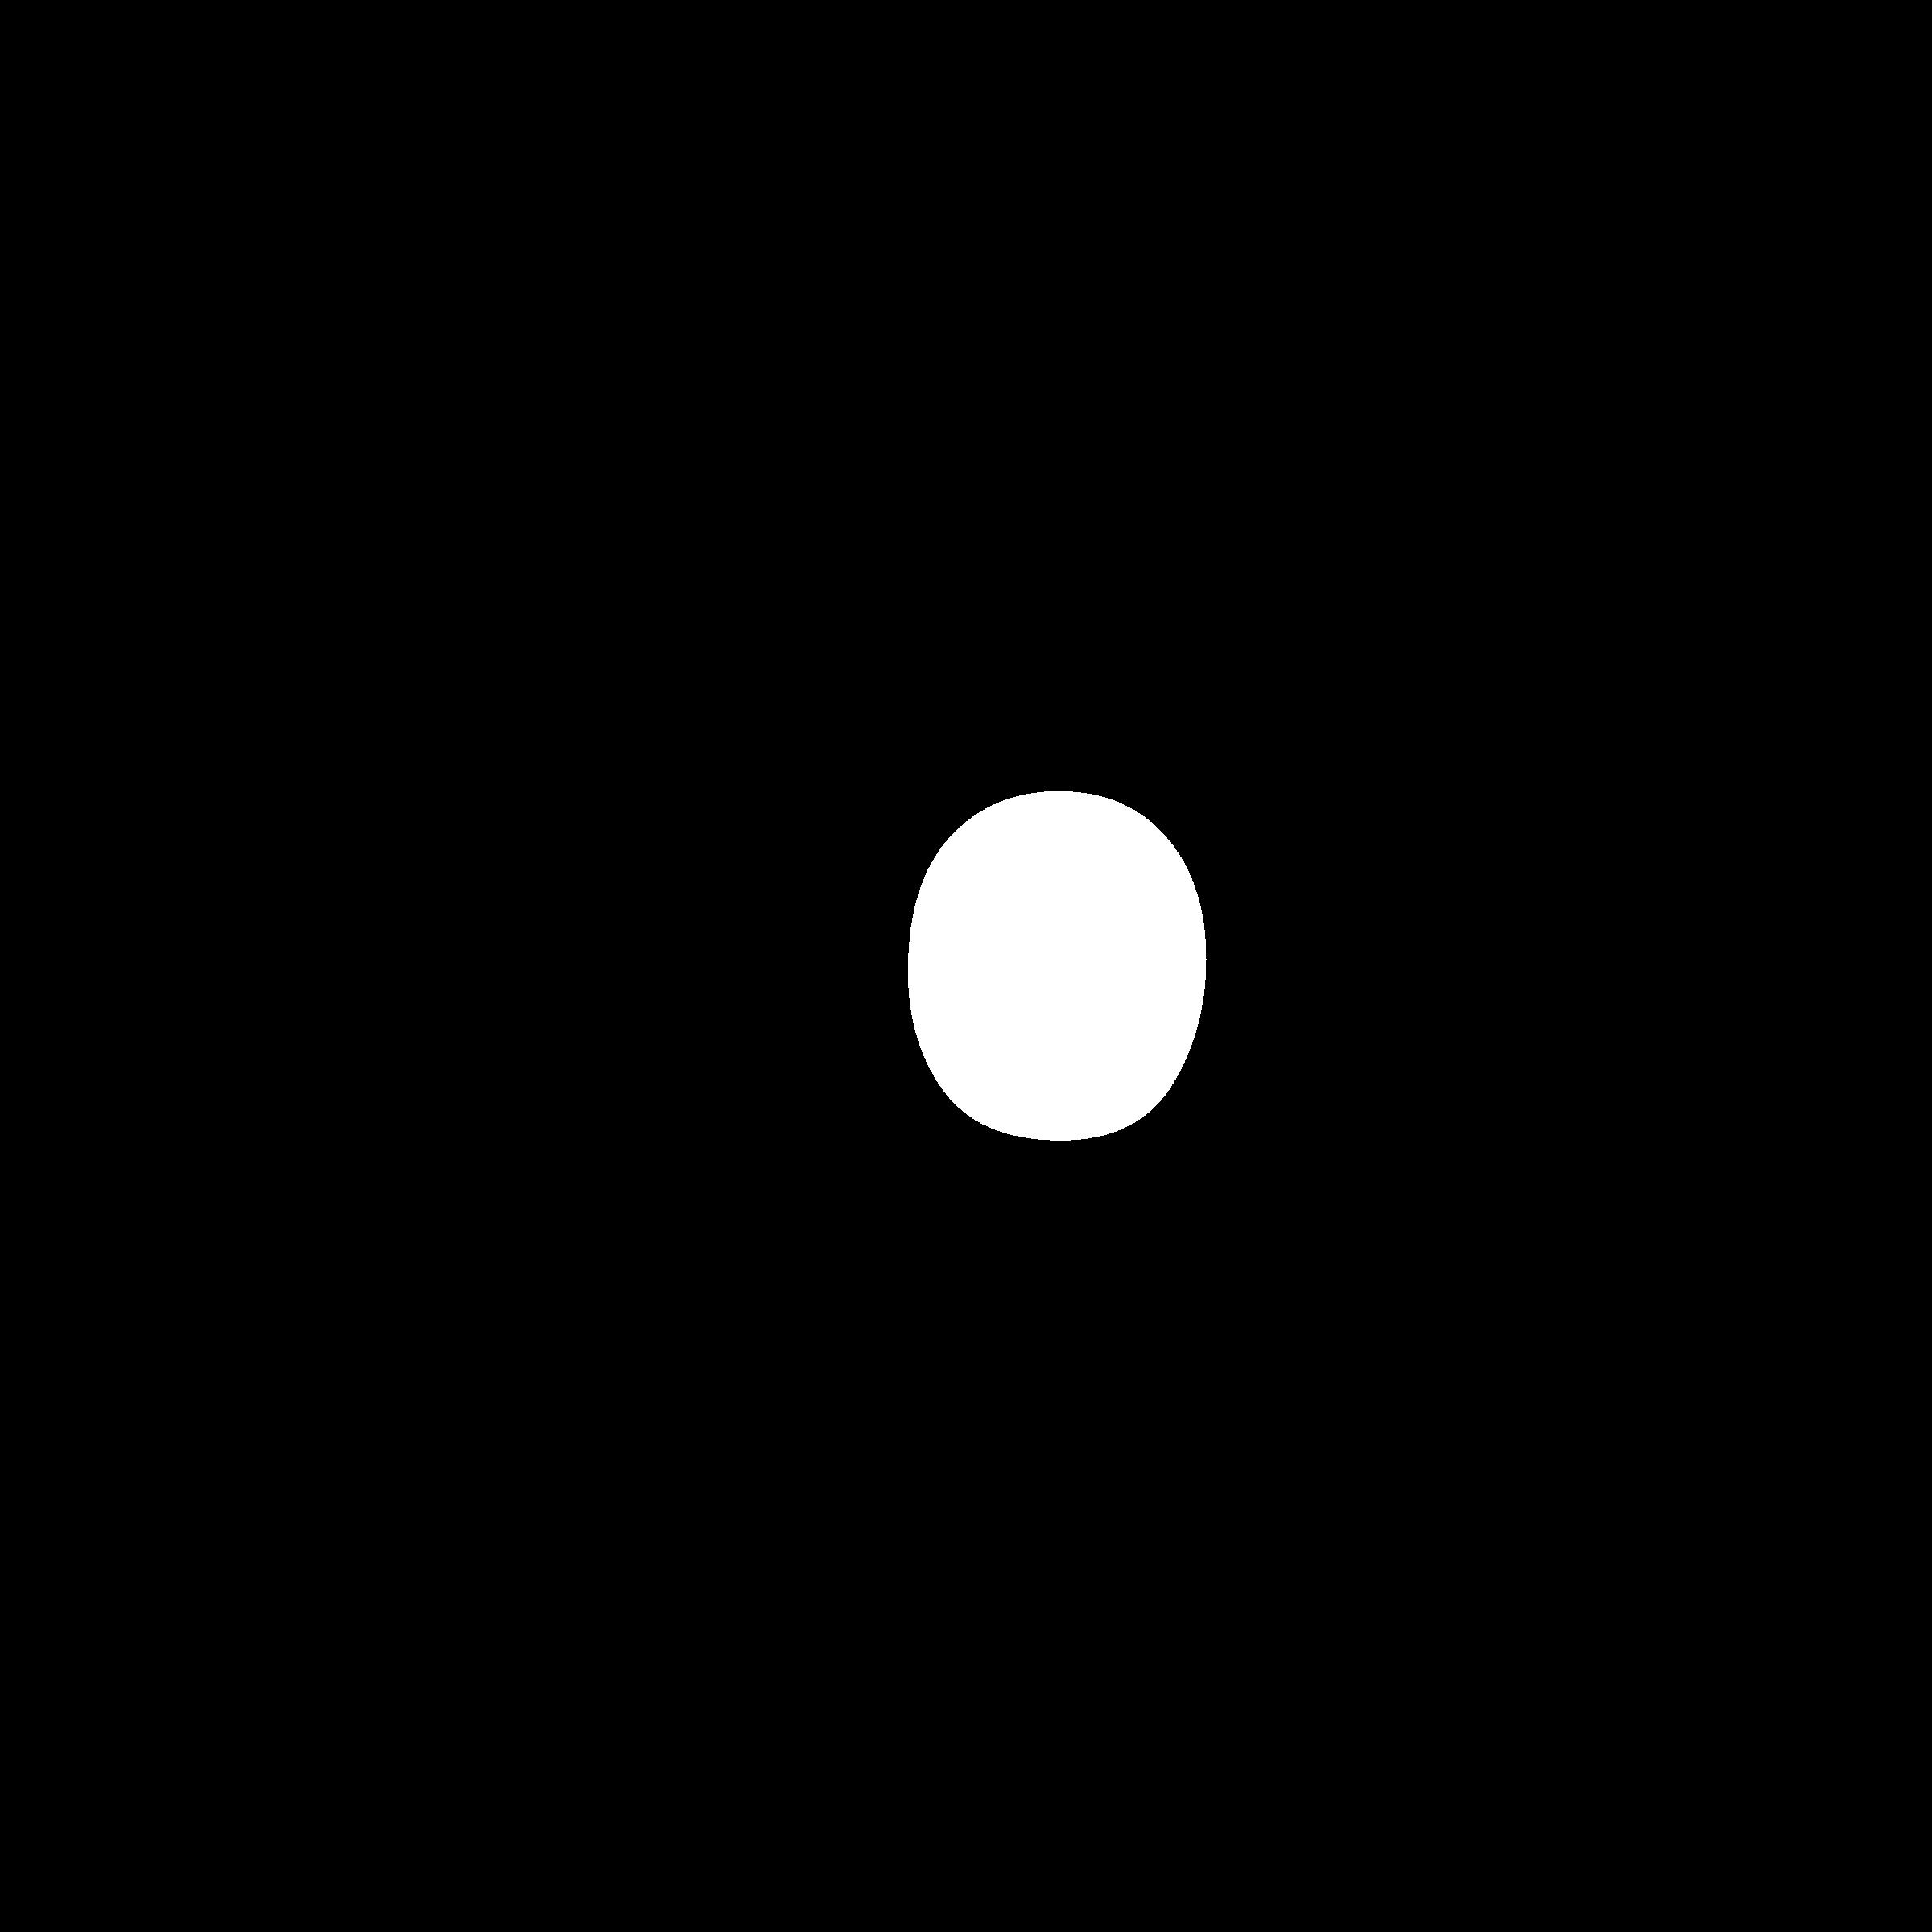 Scott Logo PNG Transparent & SVG Vector - Freebie Supply